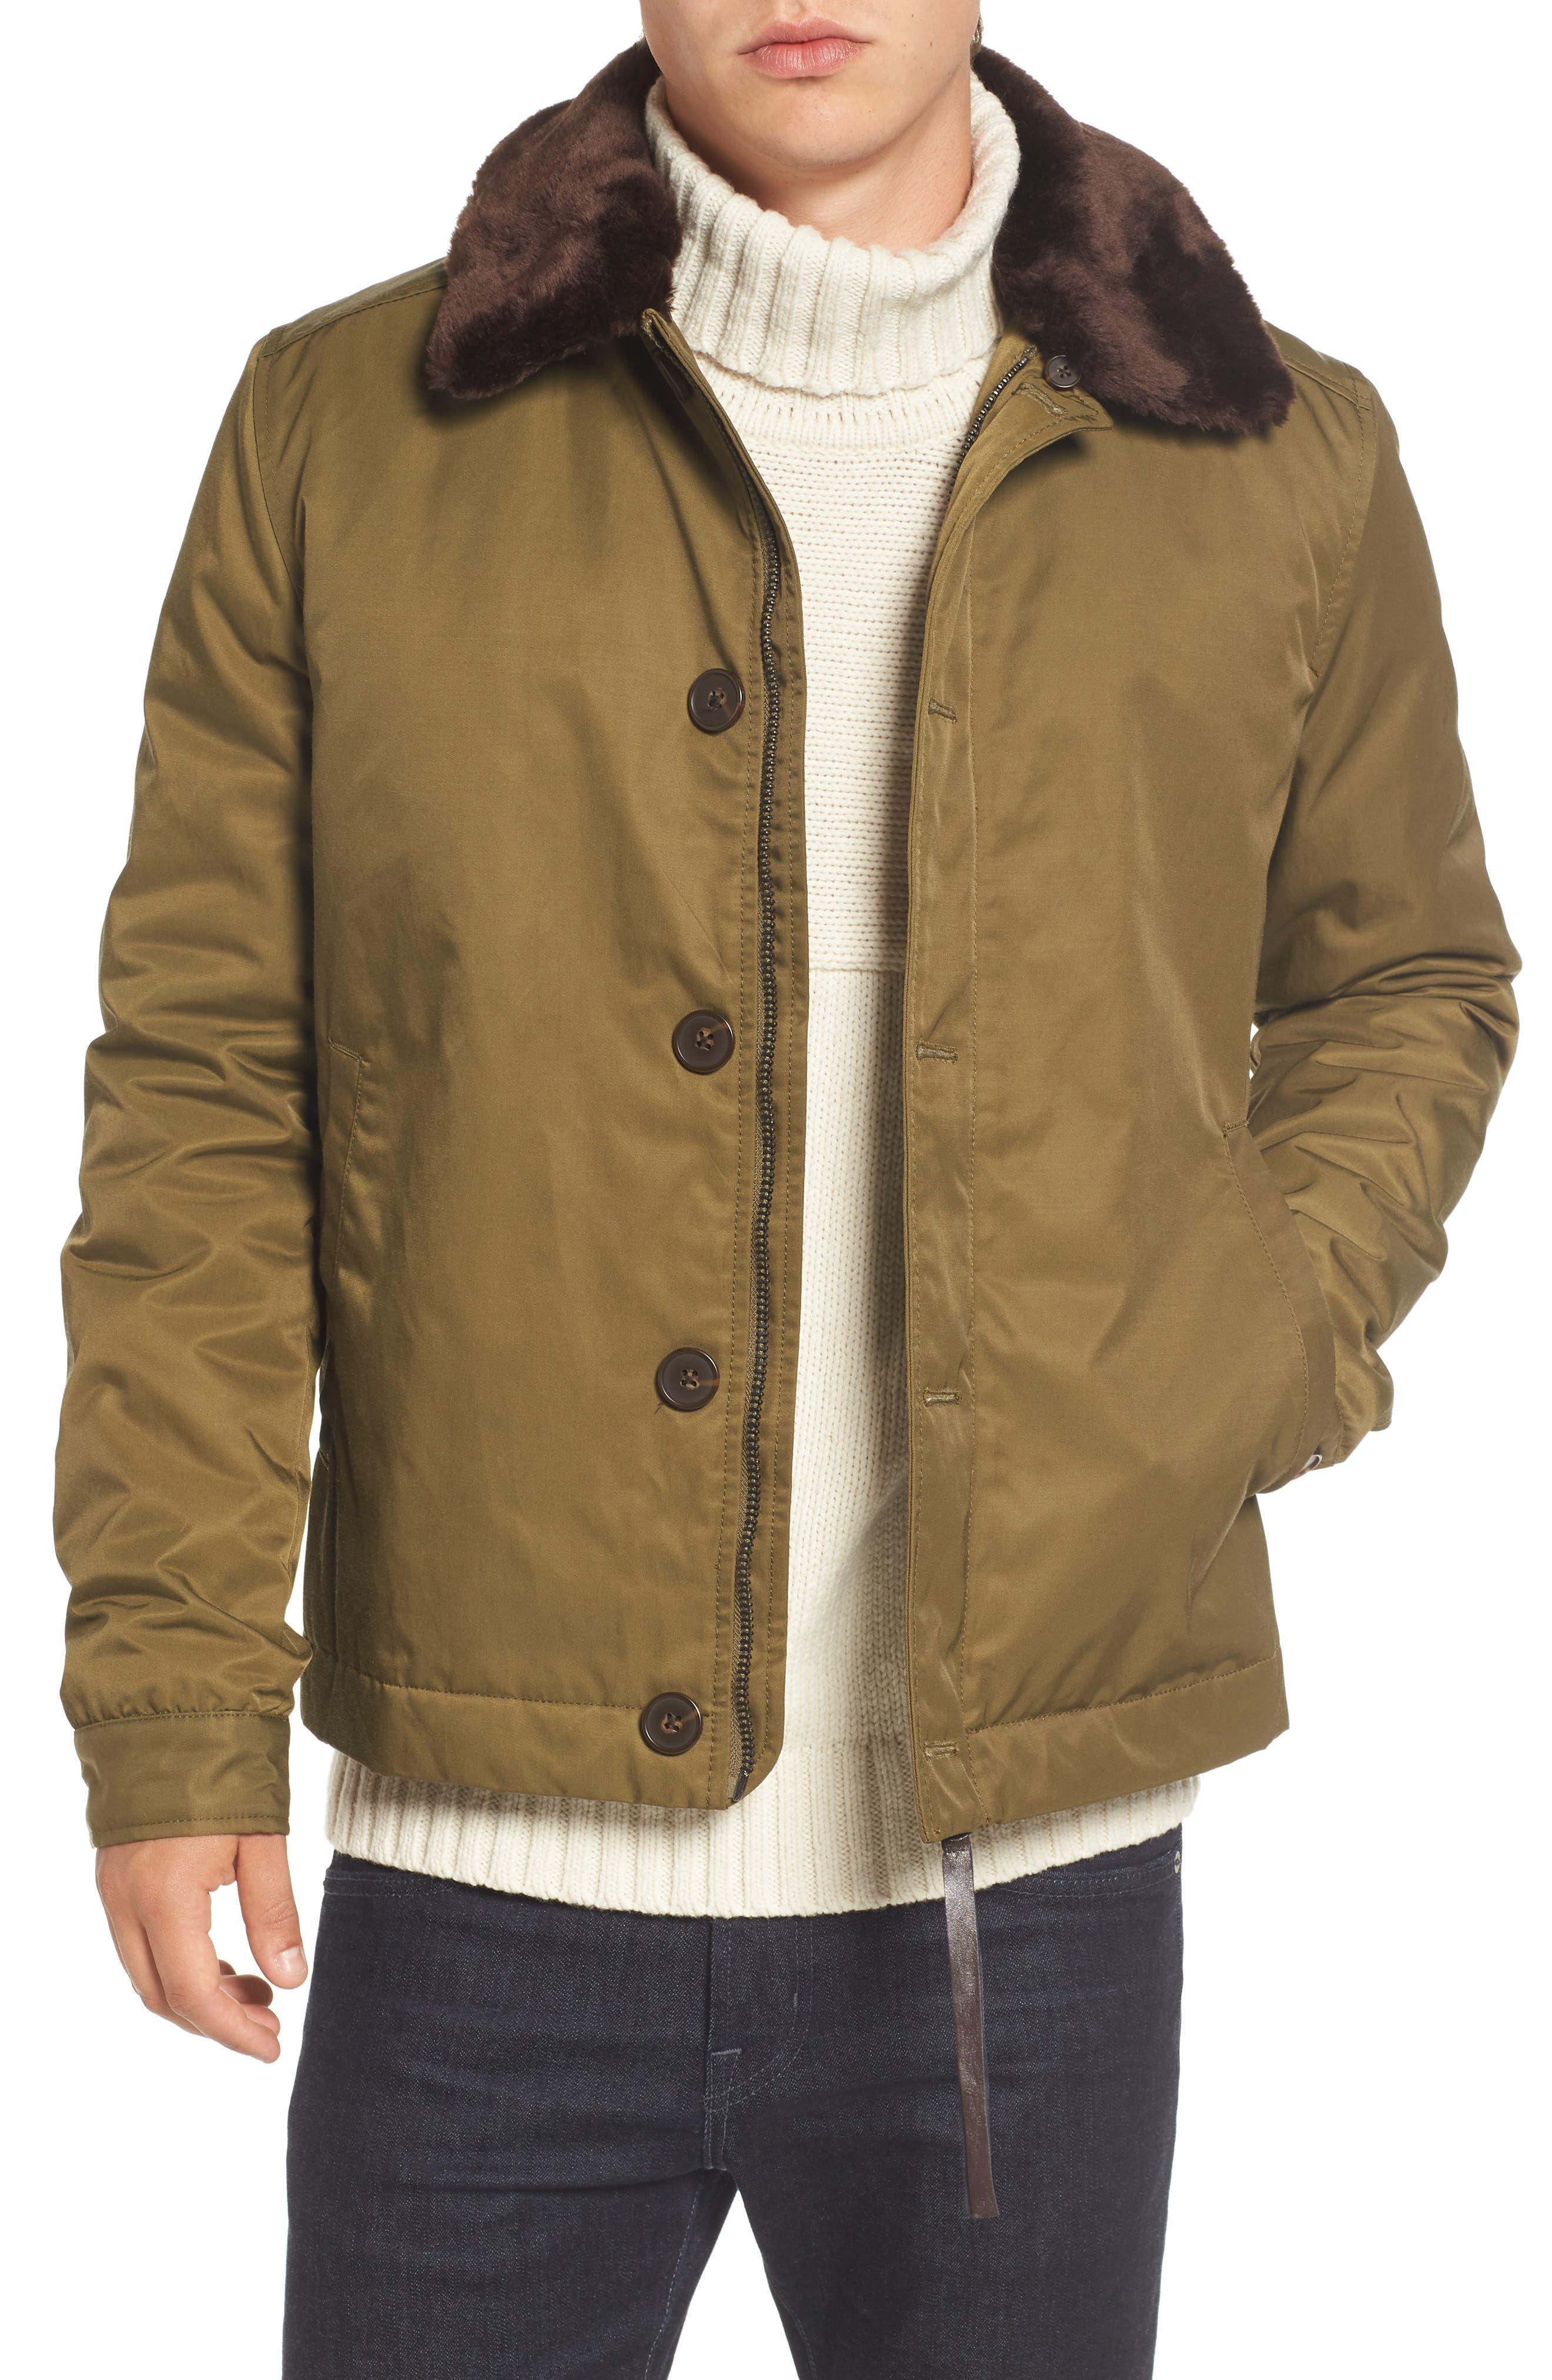 Bystander Jacket with Faux Fur Collar,                         Main,                         color, 346